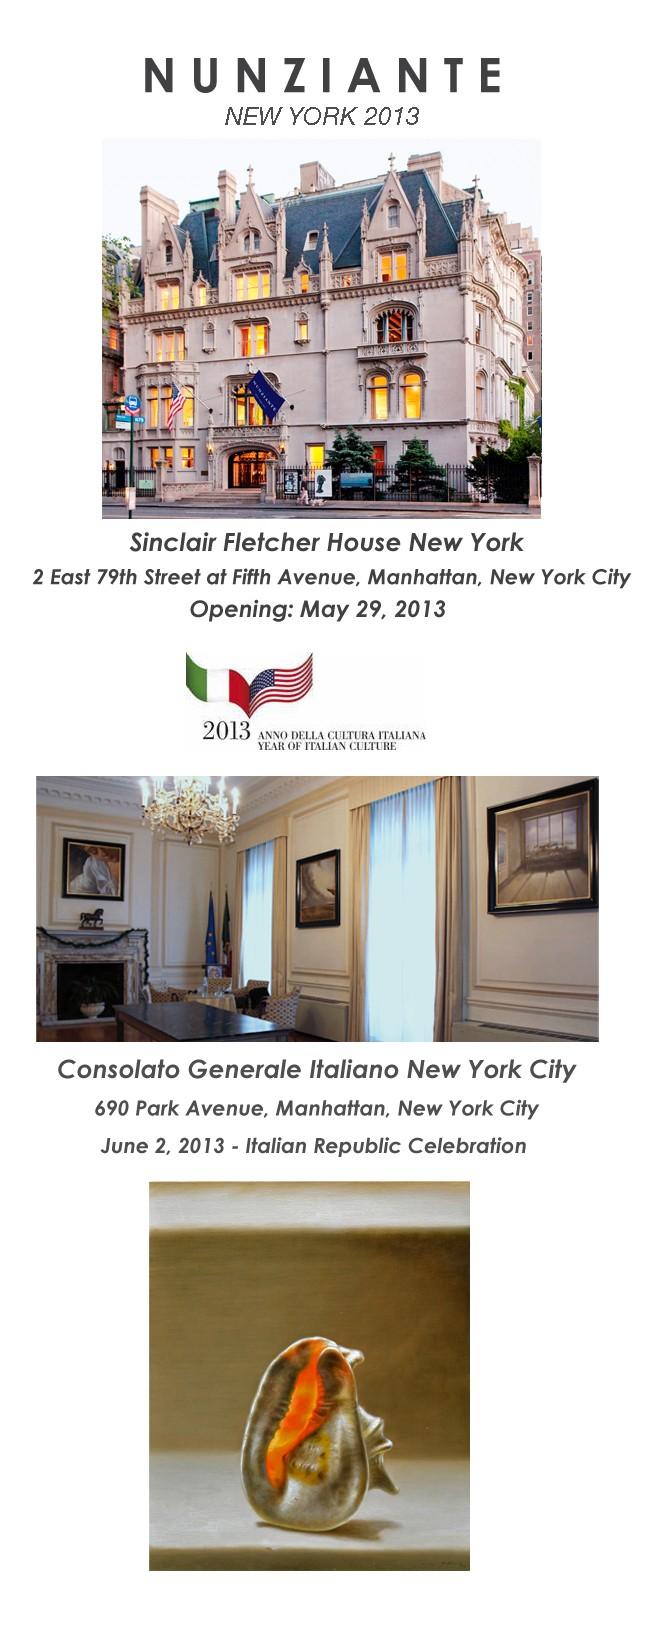 NEW YORK PREVIEW - Monza - 13 Aprile 2013 - Pagina 7 16051310